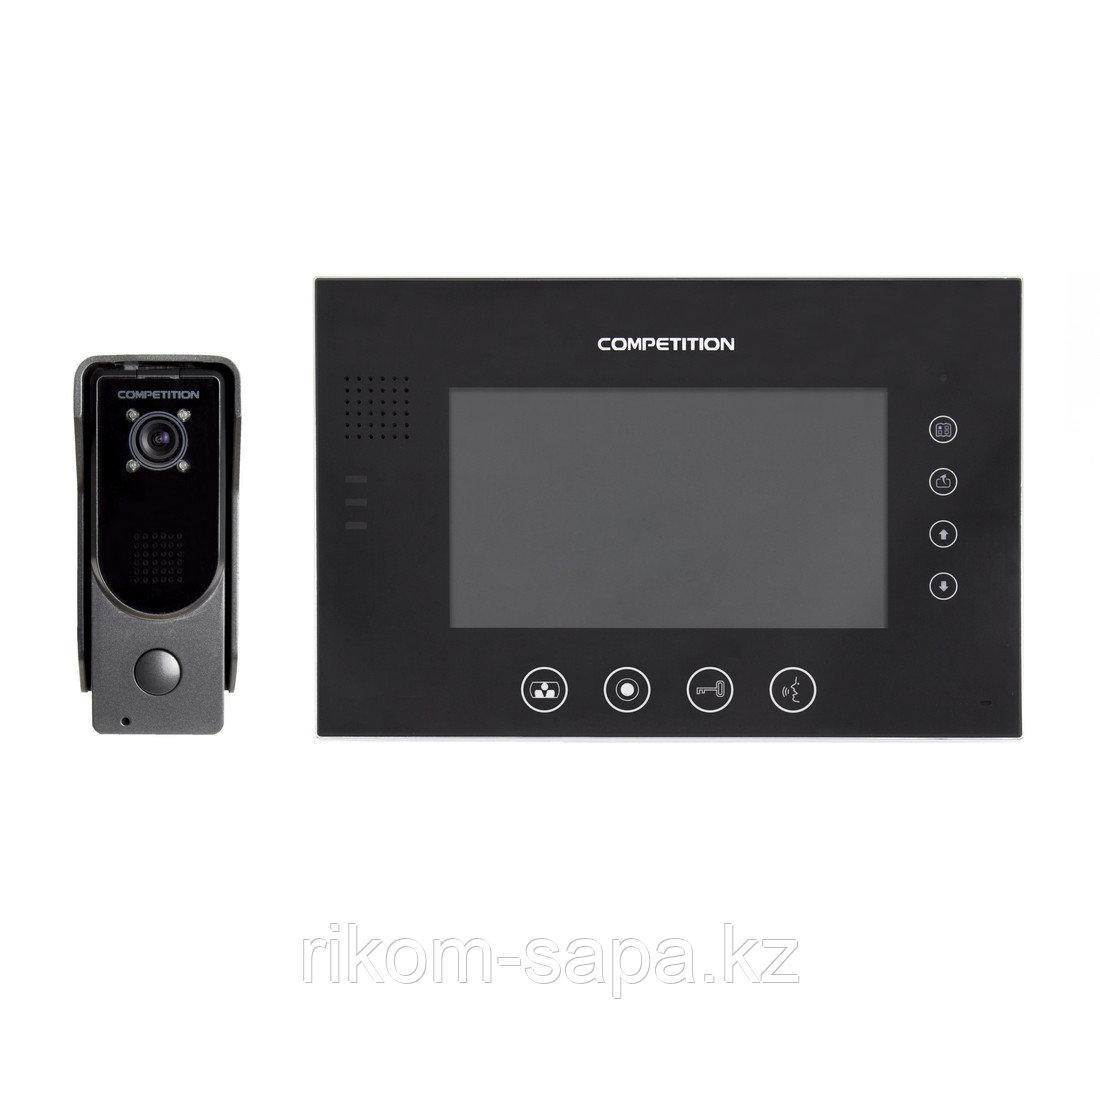 Комплект видеодомофона COMPETITION SAC7DN-CK+MT670C-CK2S1+адаптер